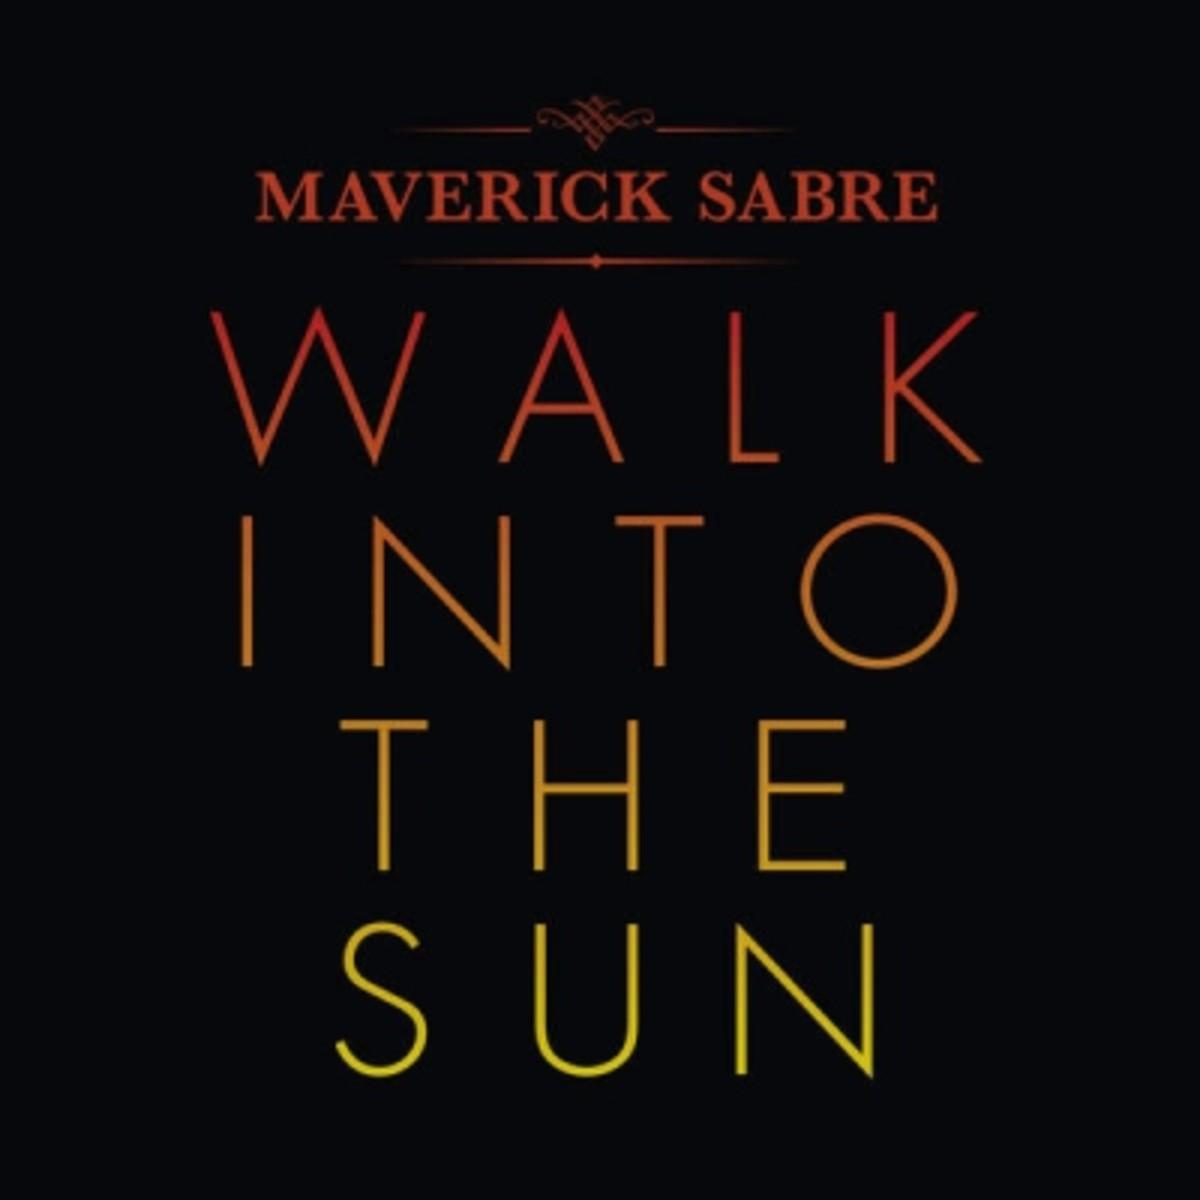 maverick-sabre-walk-into-the-sun.jpg